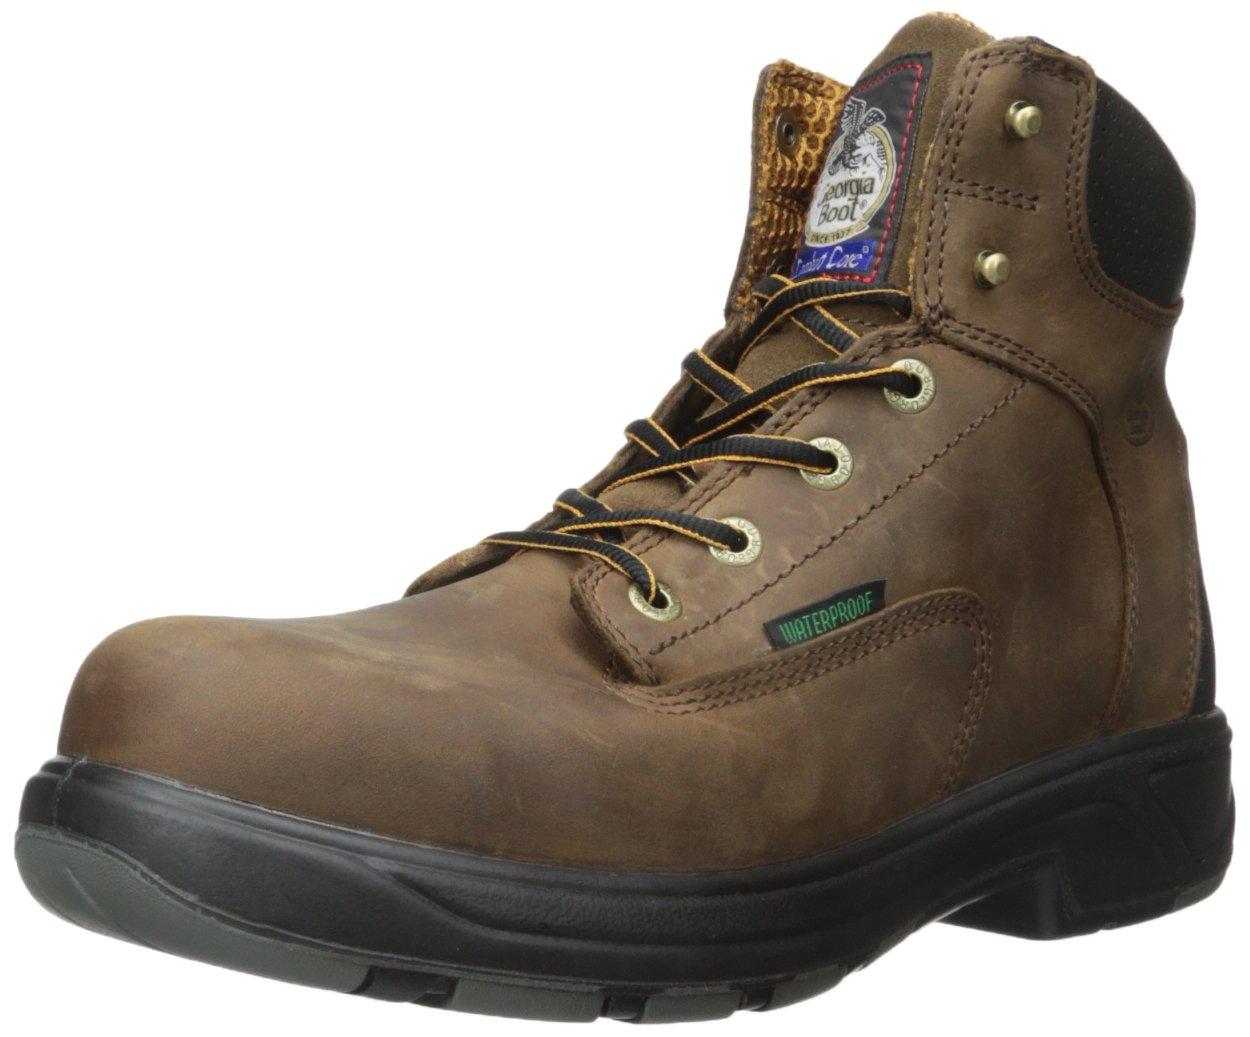 Georgia Boot メンズ B002YPPK54 9 2E US|ブラウン ブラウン 9 2E US